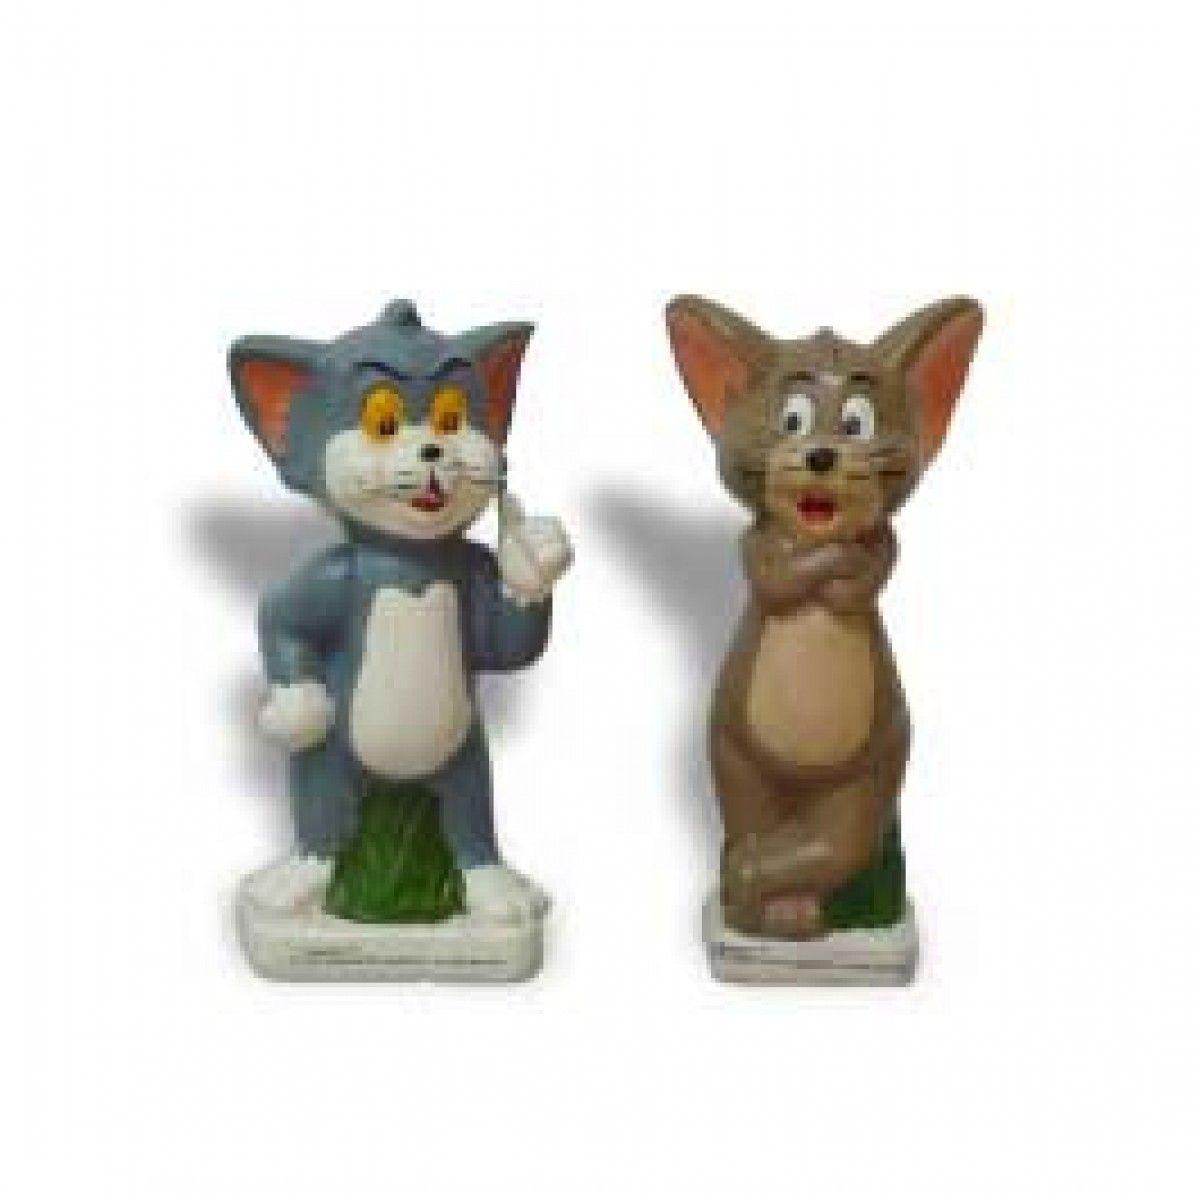 Tom and Jerry - Jeux et jouets anciens (COLLECTION) - Brocante en